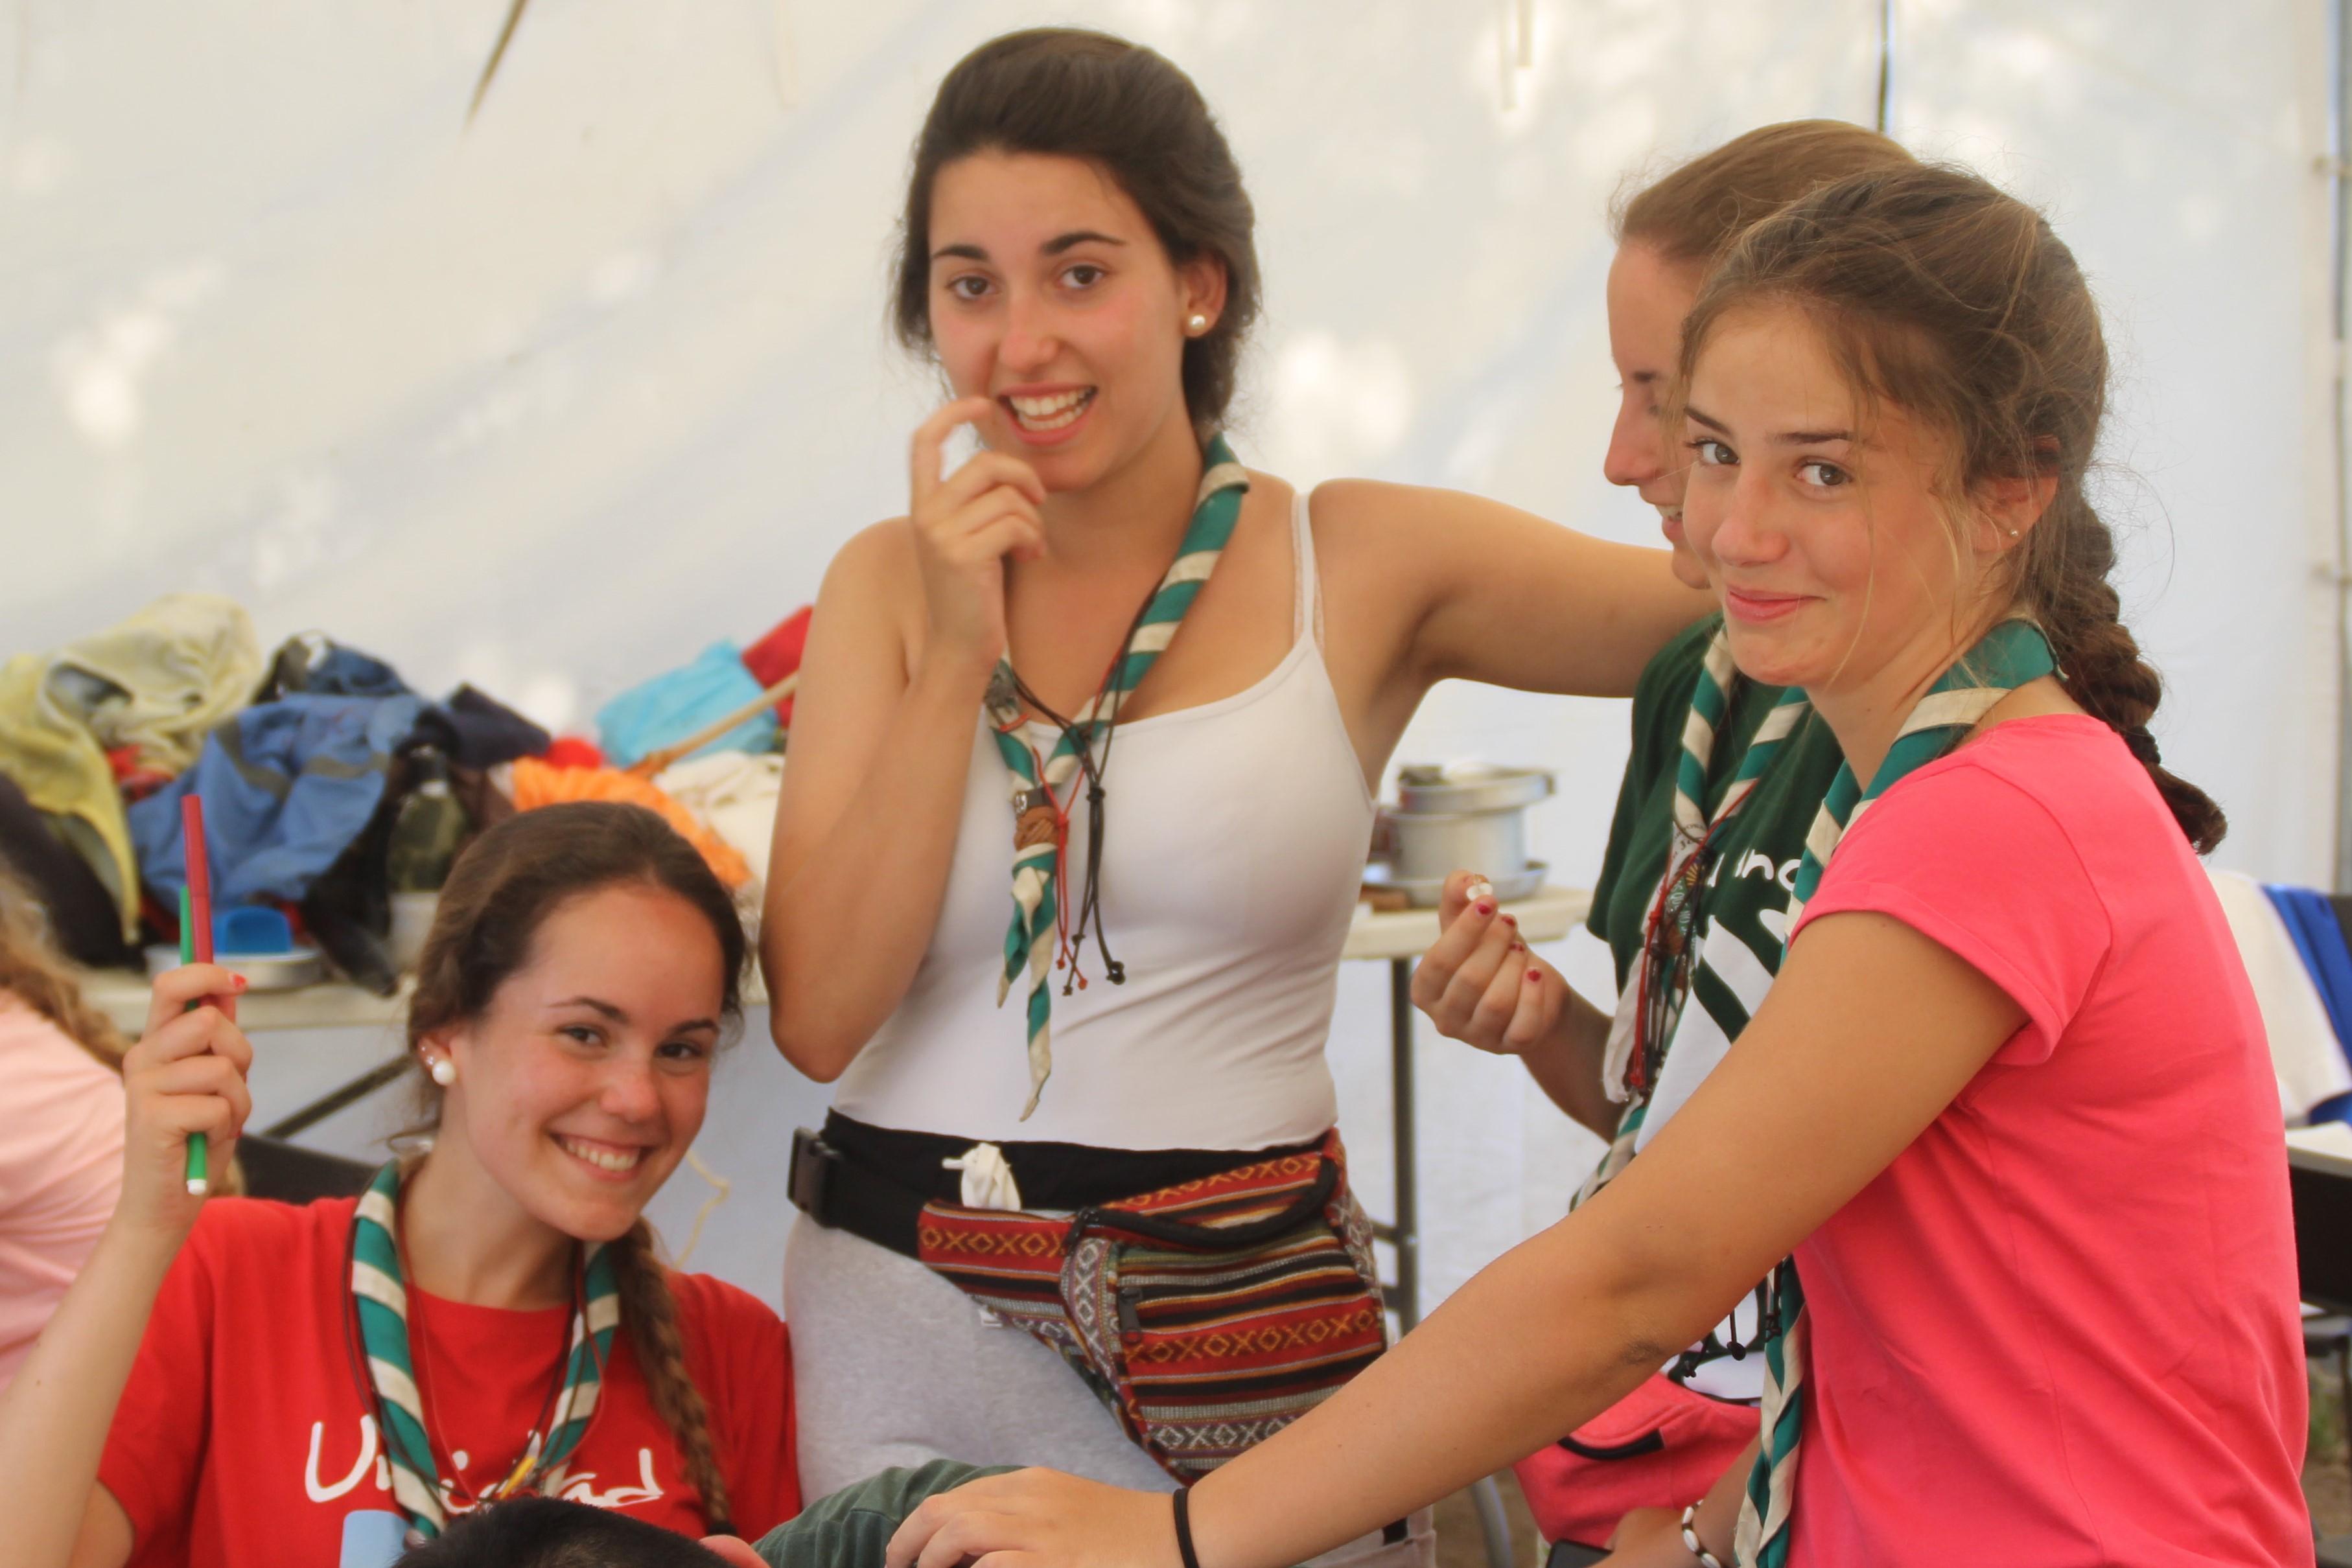 15-16 - Grupo - Campamento de verano - P244